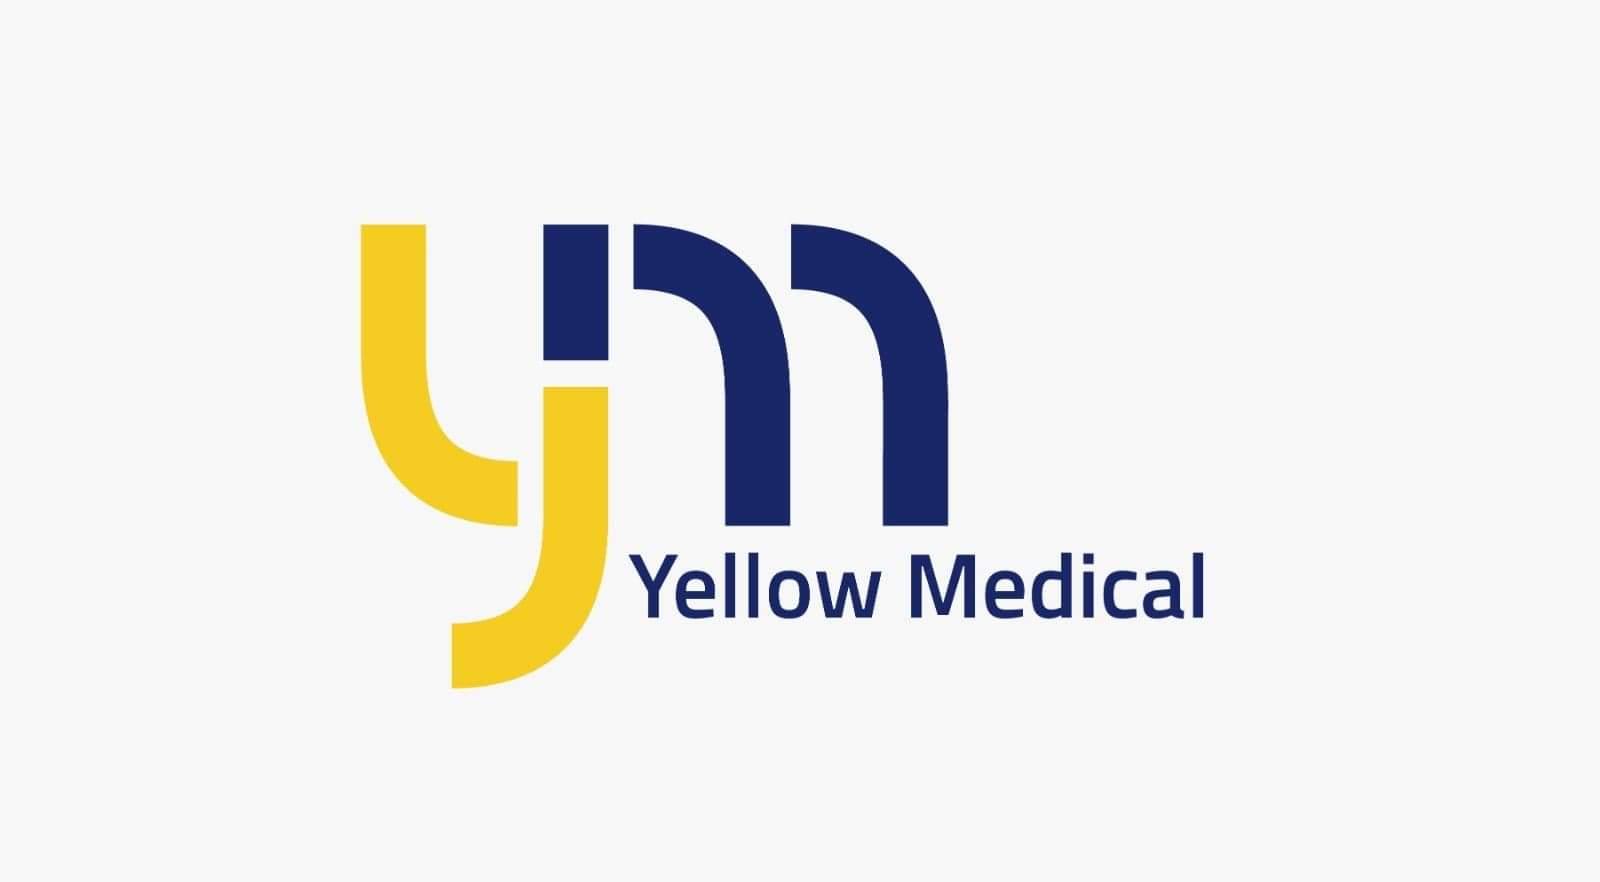 Yellow Medical